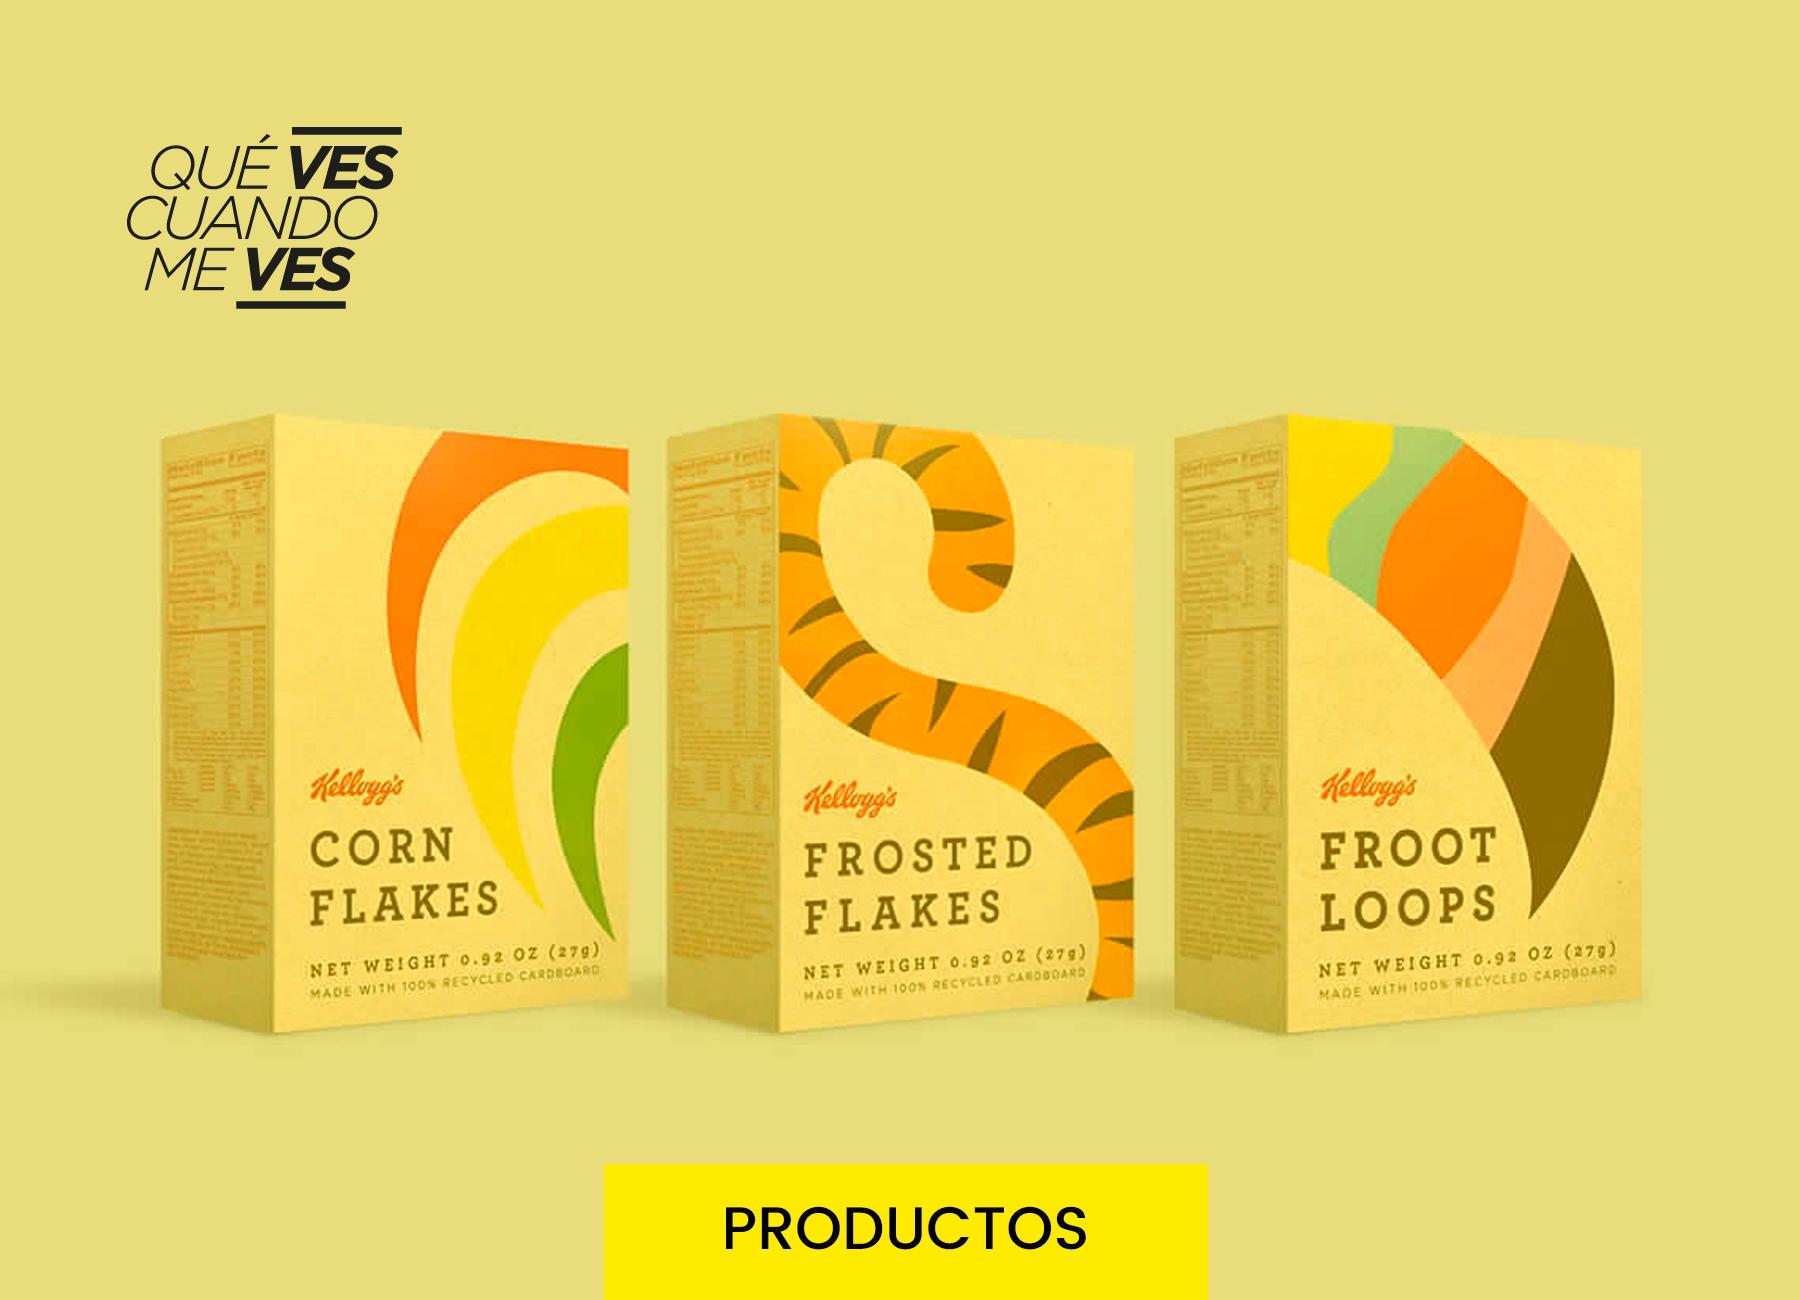 Logotipos: ¿Cuáles son las infografías? Marcela Seggiaro